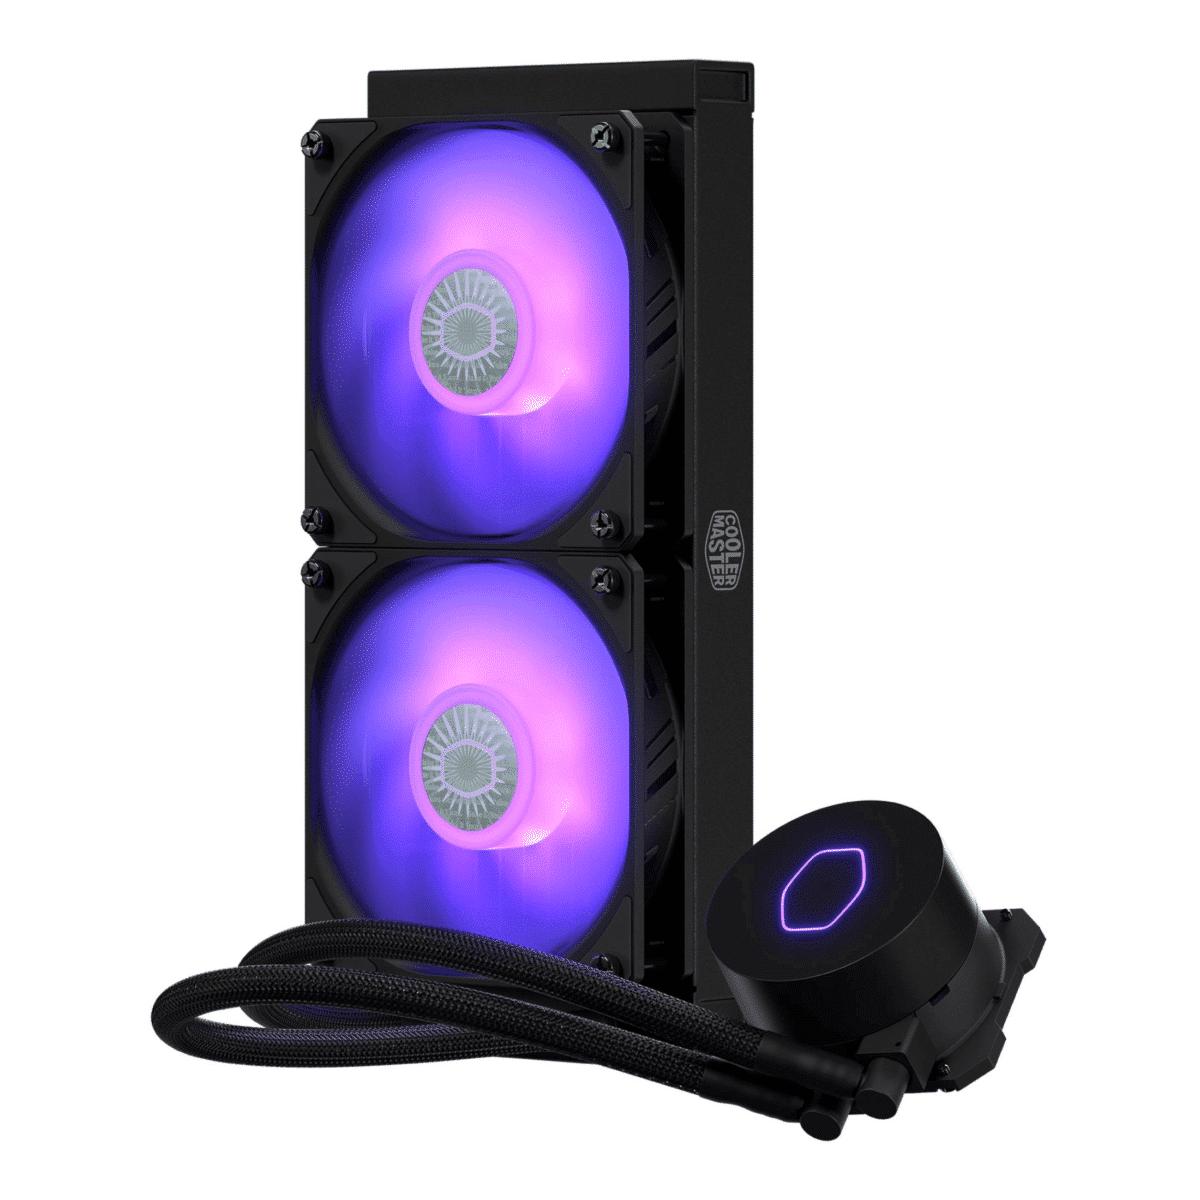 Cooler Master MasterLiquid ML240L V2 RGB CPU Liquid Cooler MLW-D24M-A18PC-R2